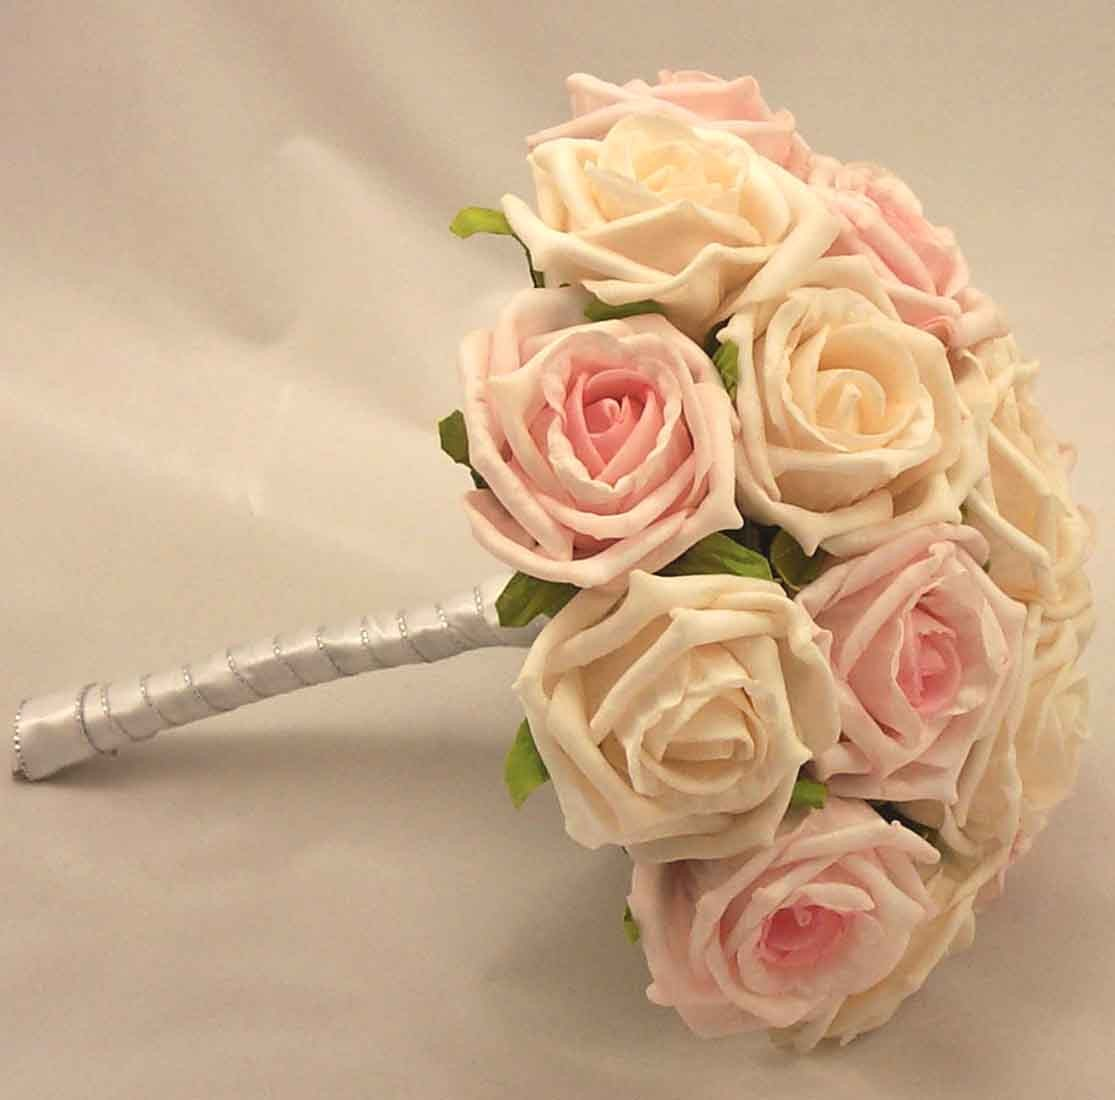 Cream & Light Pink Bridesmaid's Posy